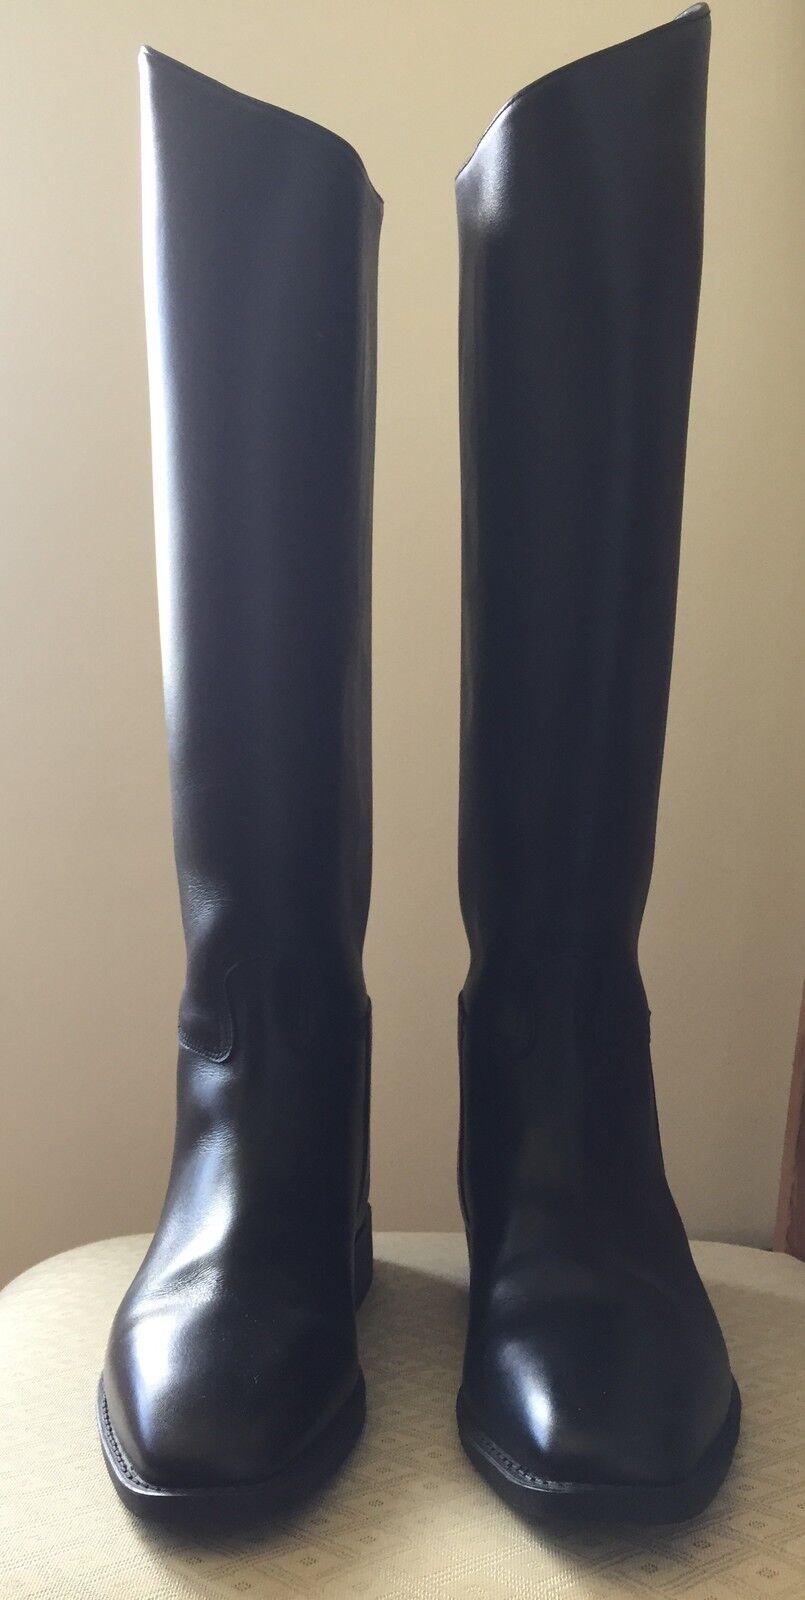 Cavallo Winner Mens Riding Boots Size 7 Calf